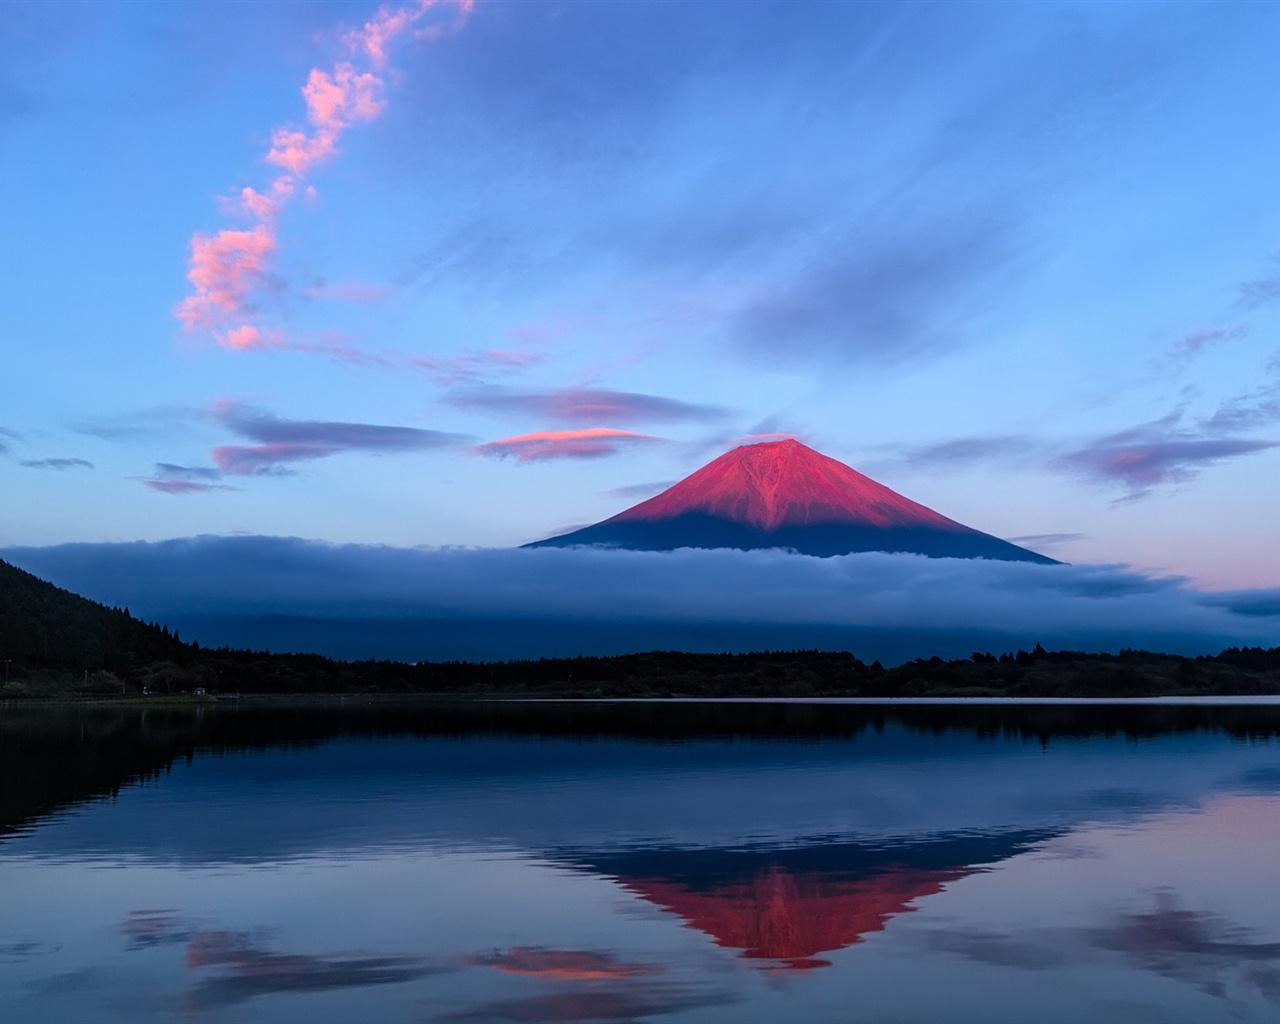 sky blue mountain reflection - photo #1